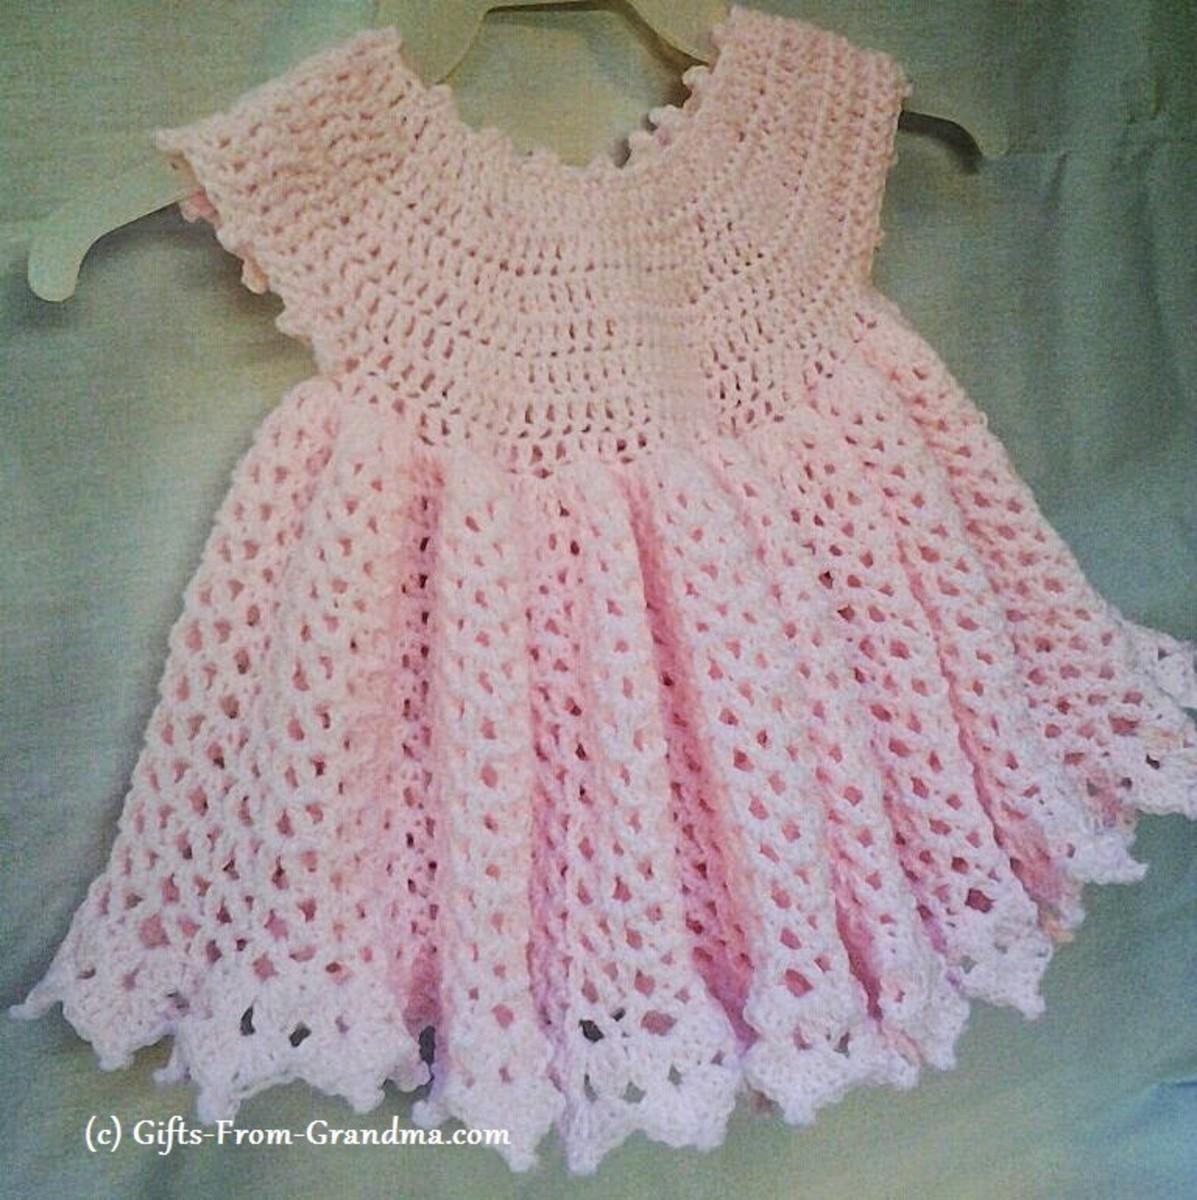 Free Crochet Patterns for Baby Dresses | FeltMagnet